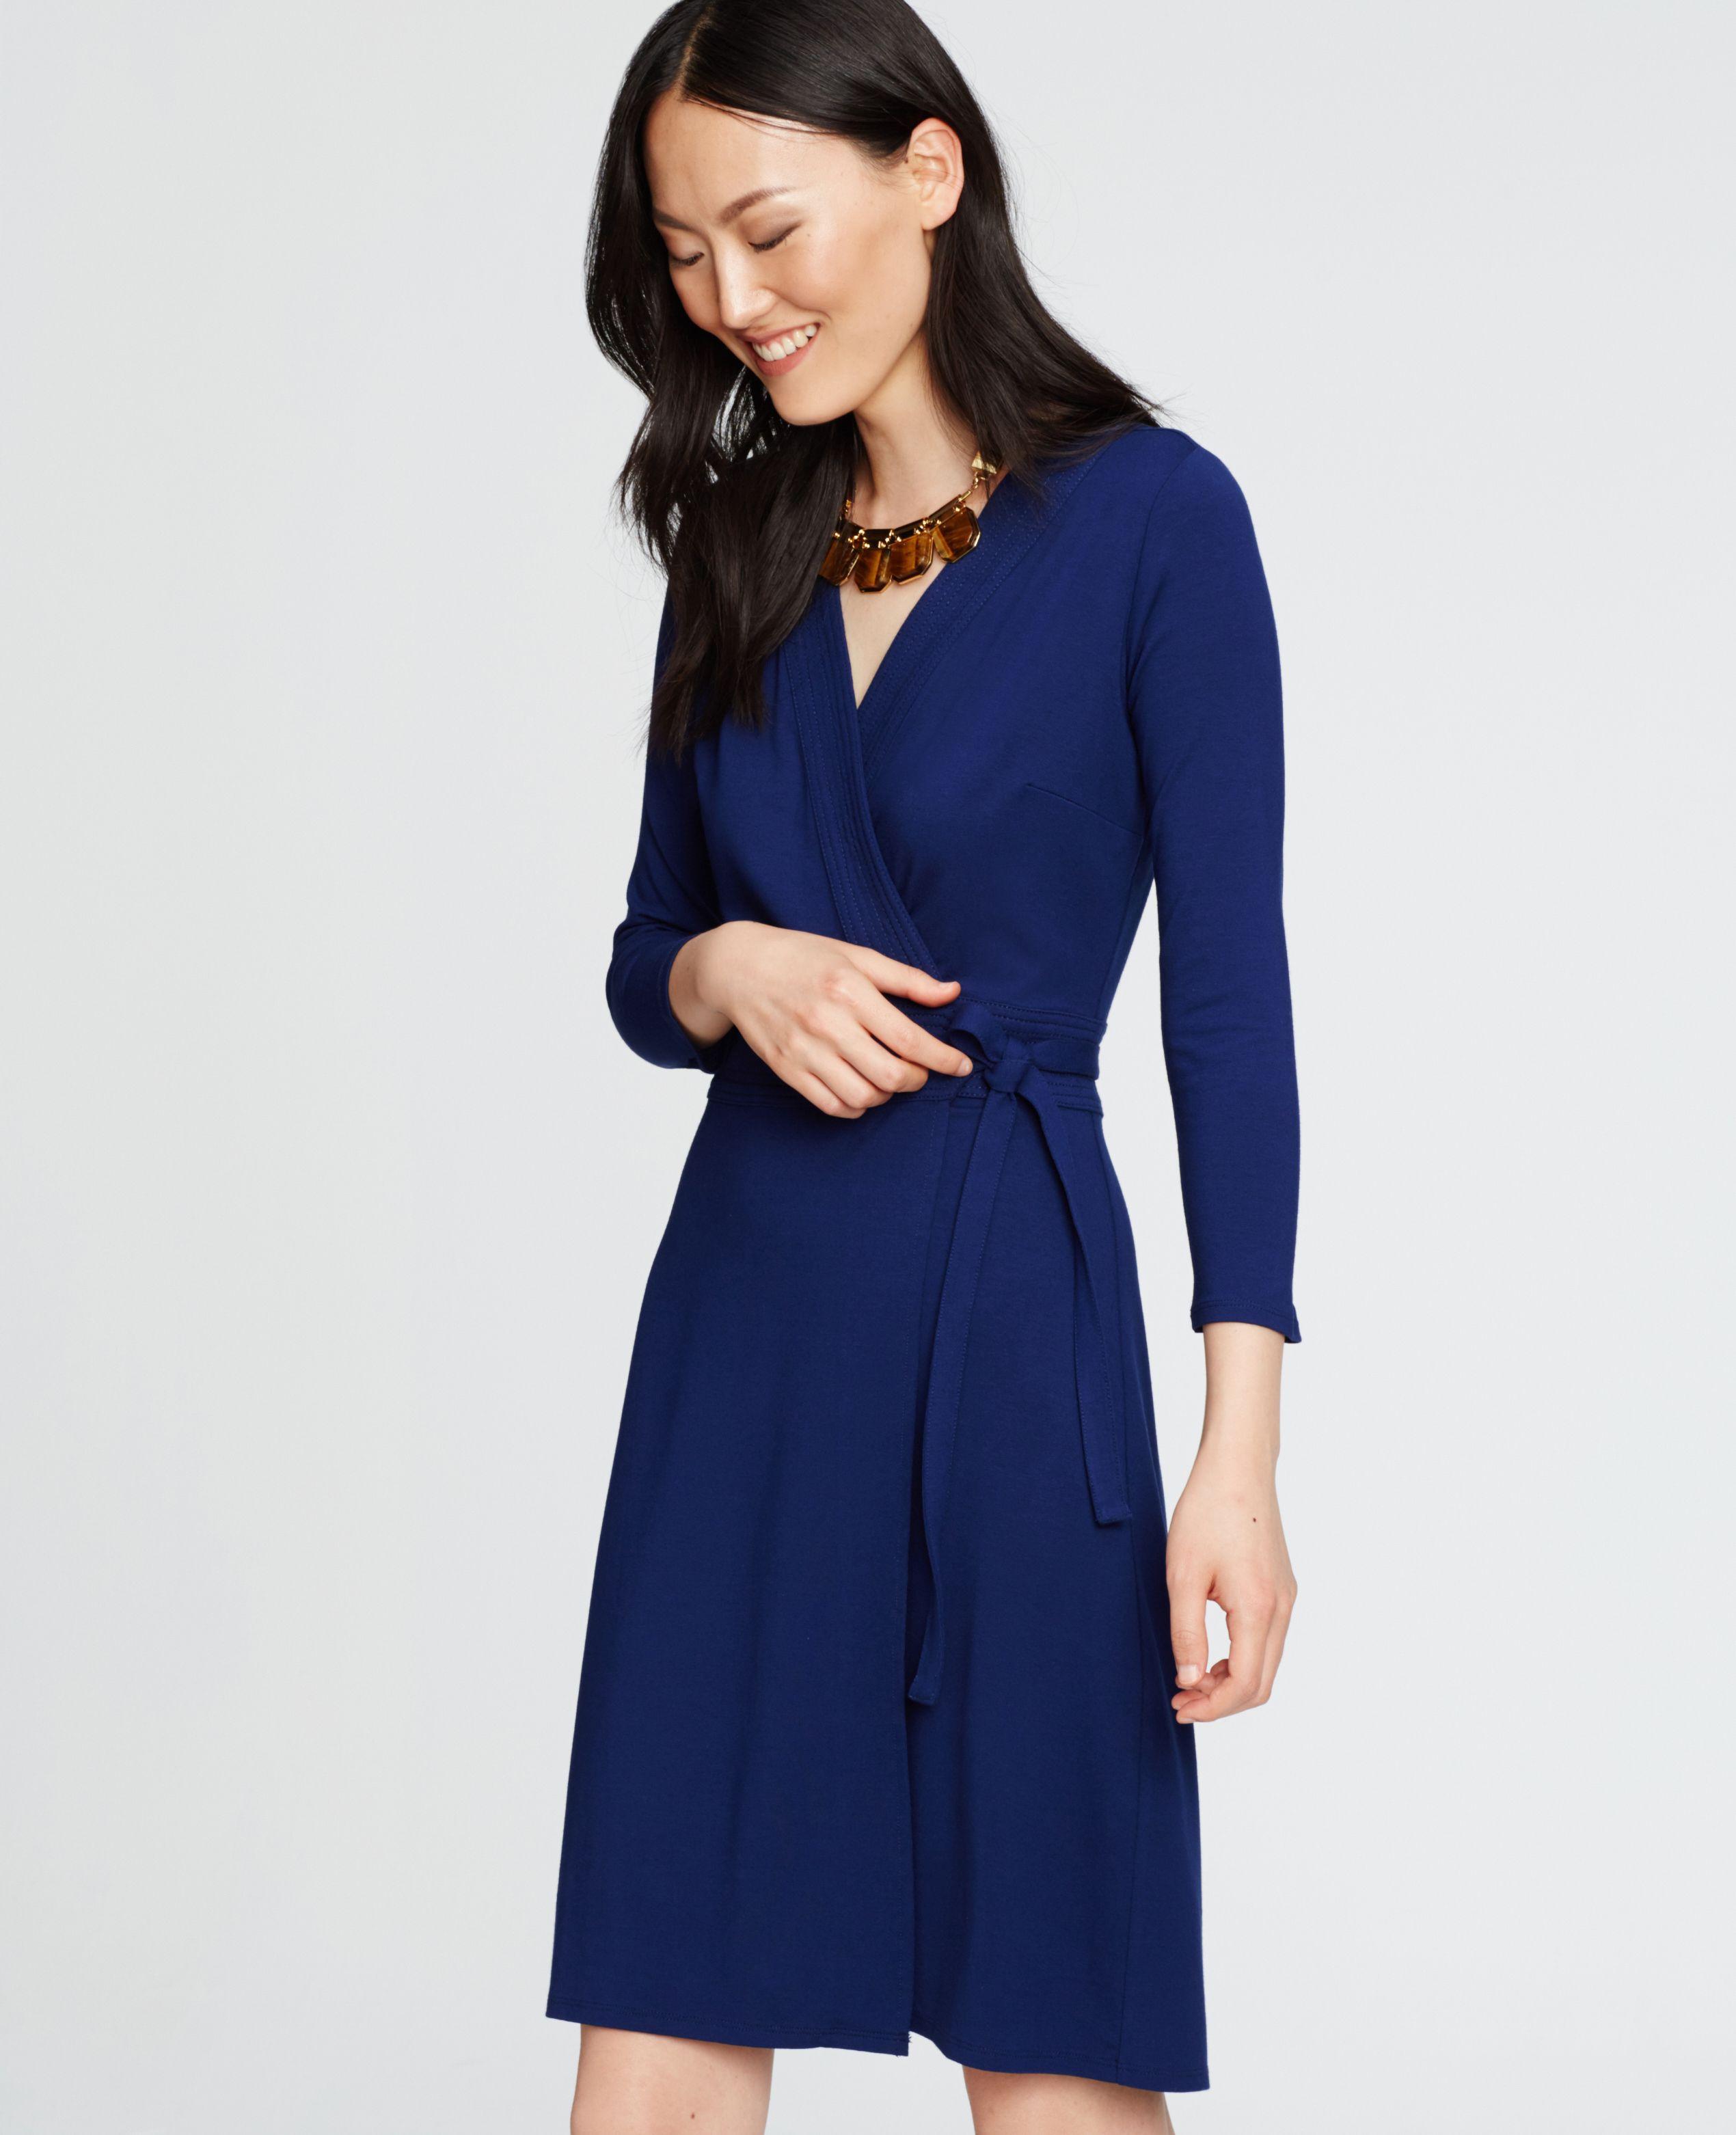 3 4 Sleeve Wrap Dress Ann Taylor Professional Dresses Wrap Dress Dresses [ 3124 x 2540 Pixel ]